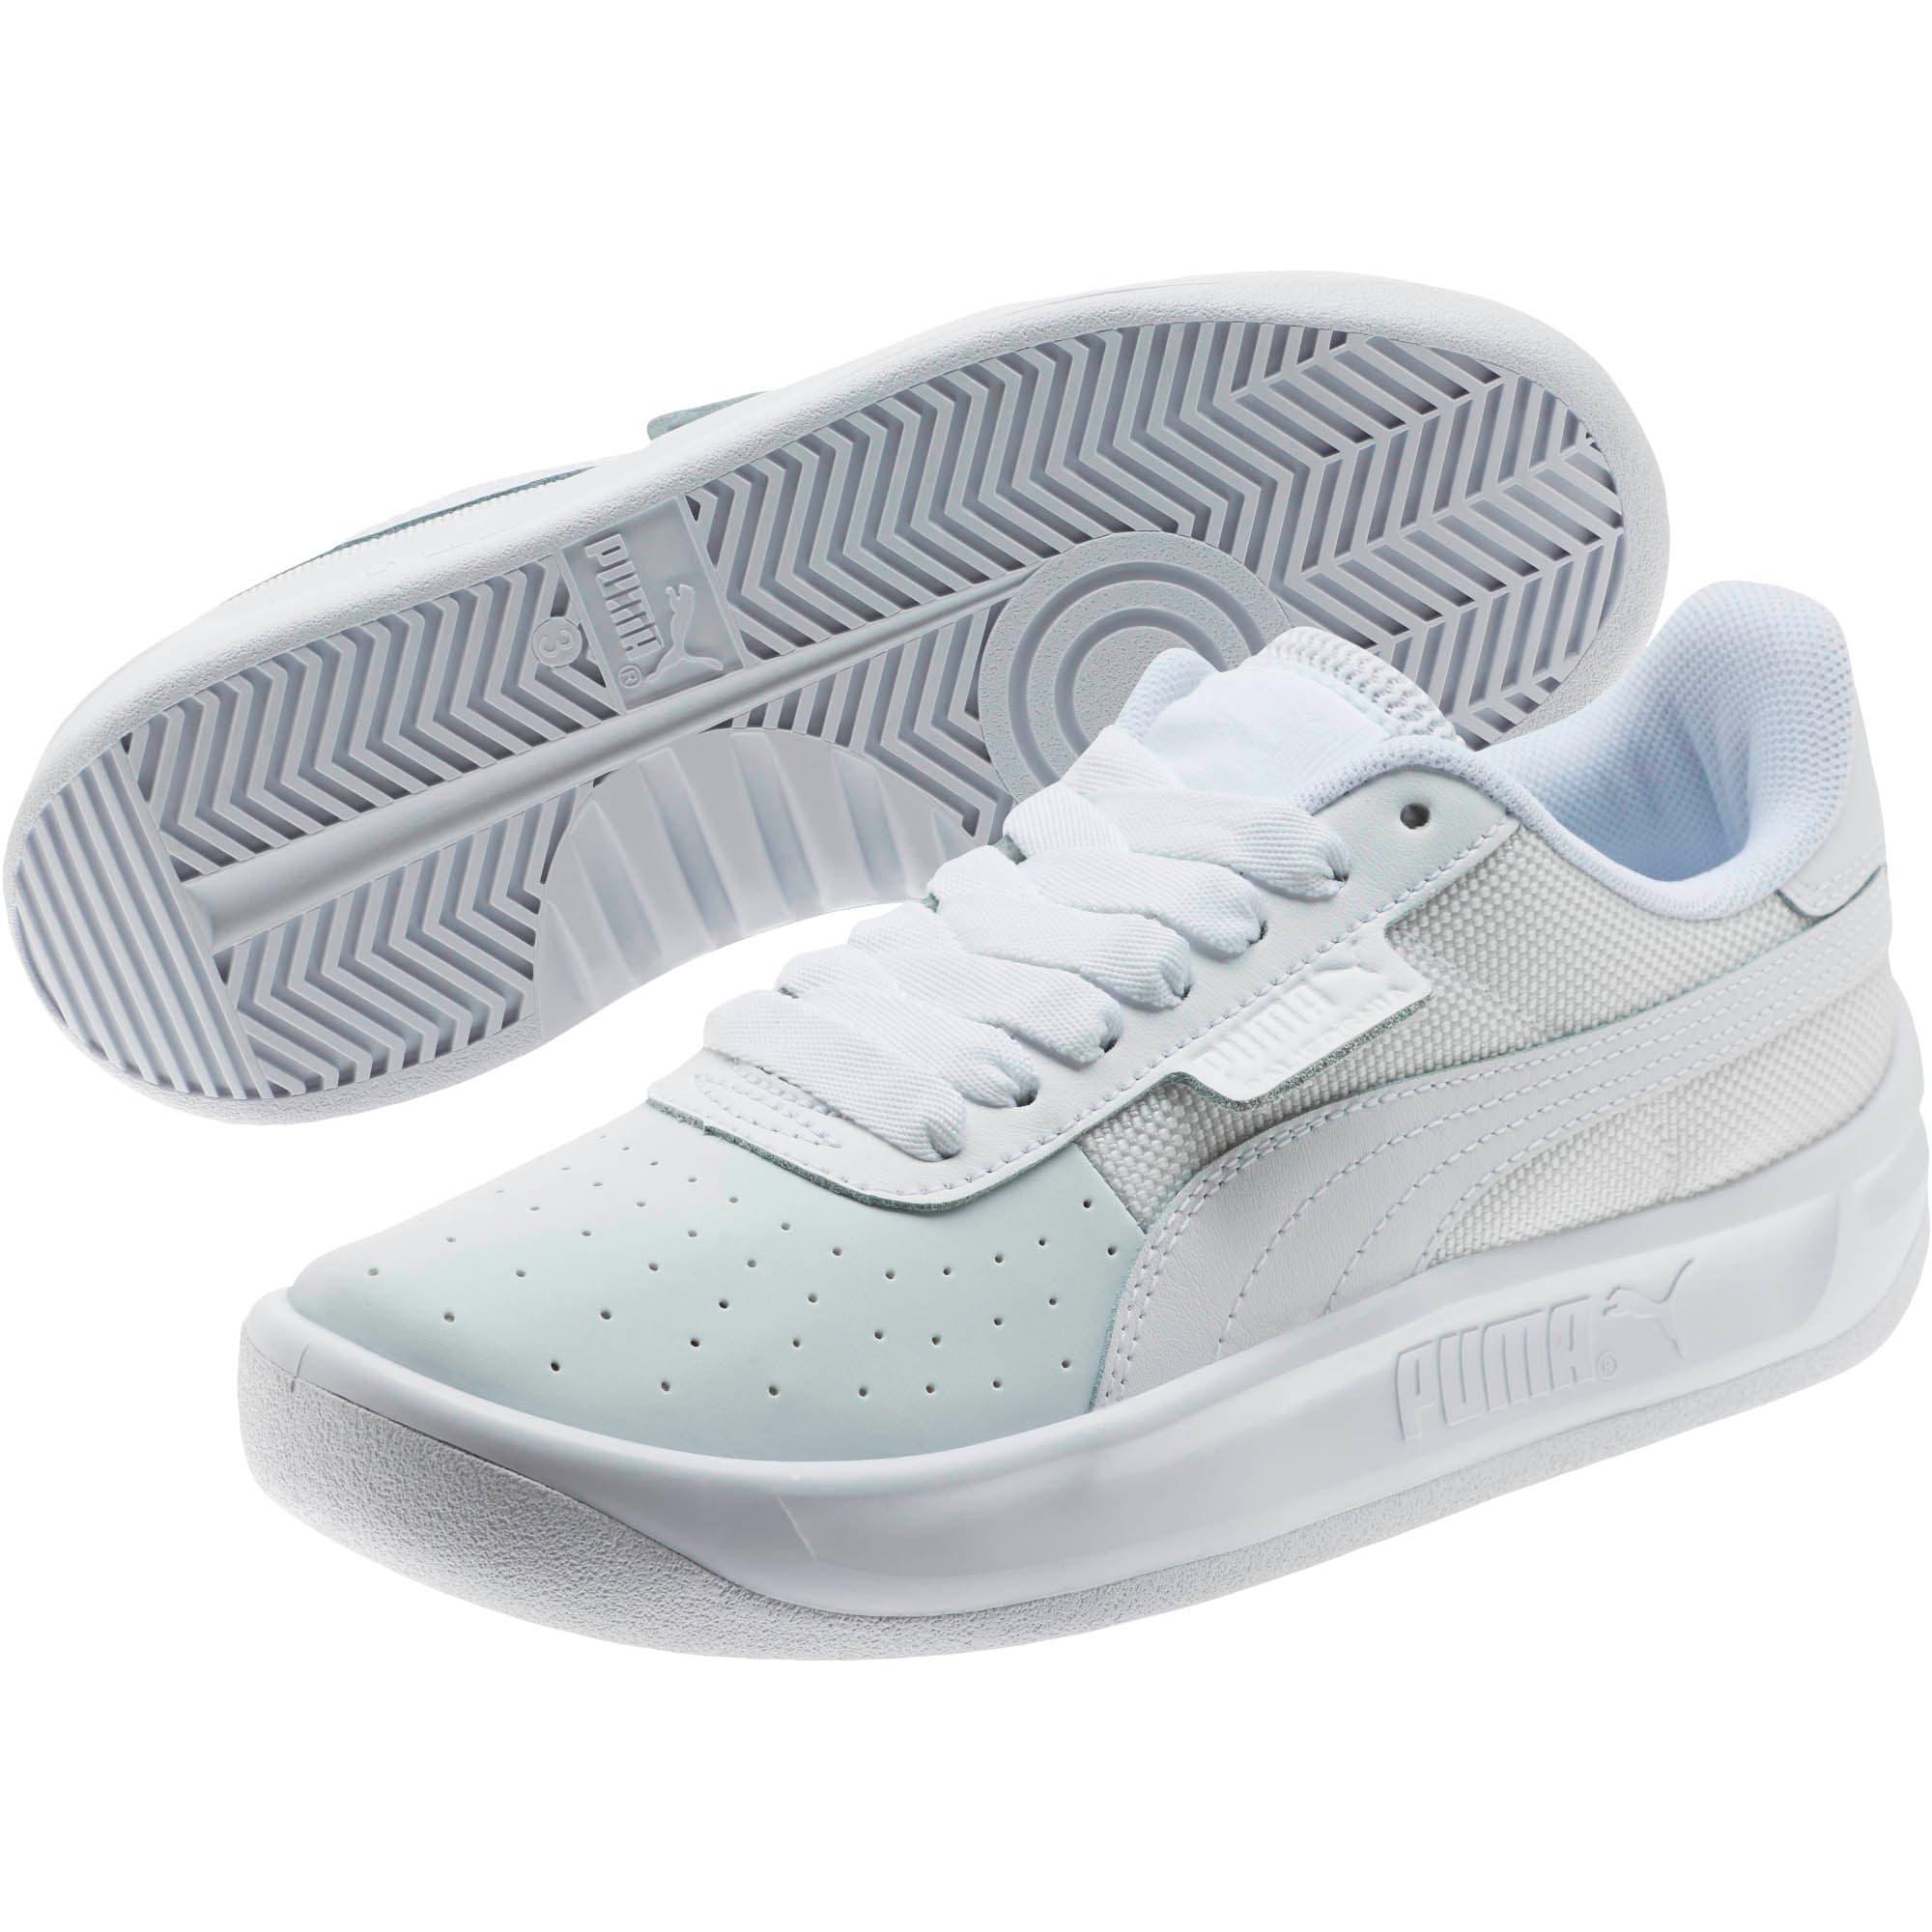 Thumbnail 2 of California Sneakers JR, P White-P White-P White, medium